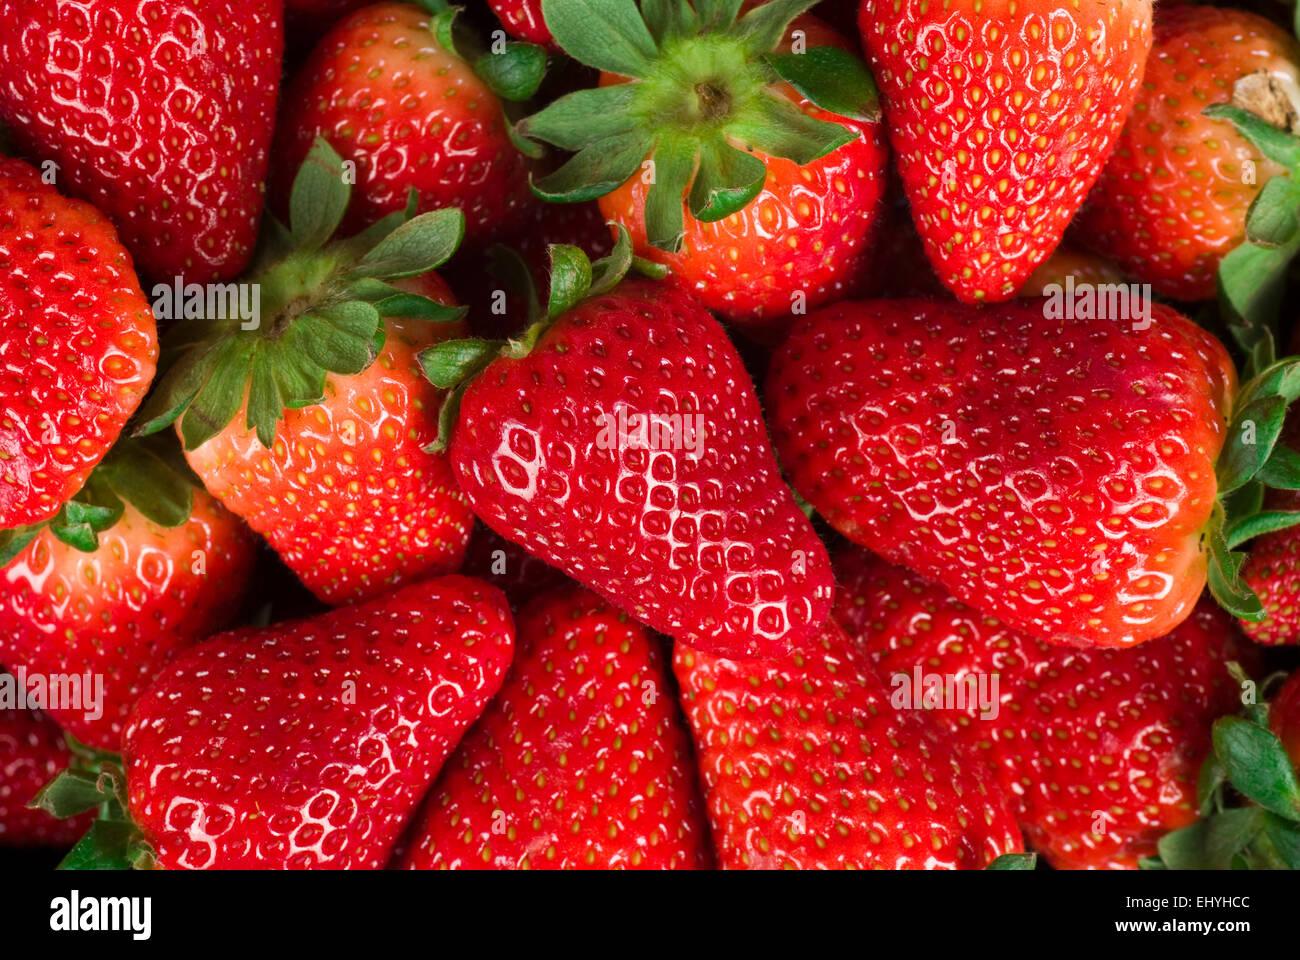 Ripe strawberry background close up full frame. - Stock Image